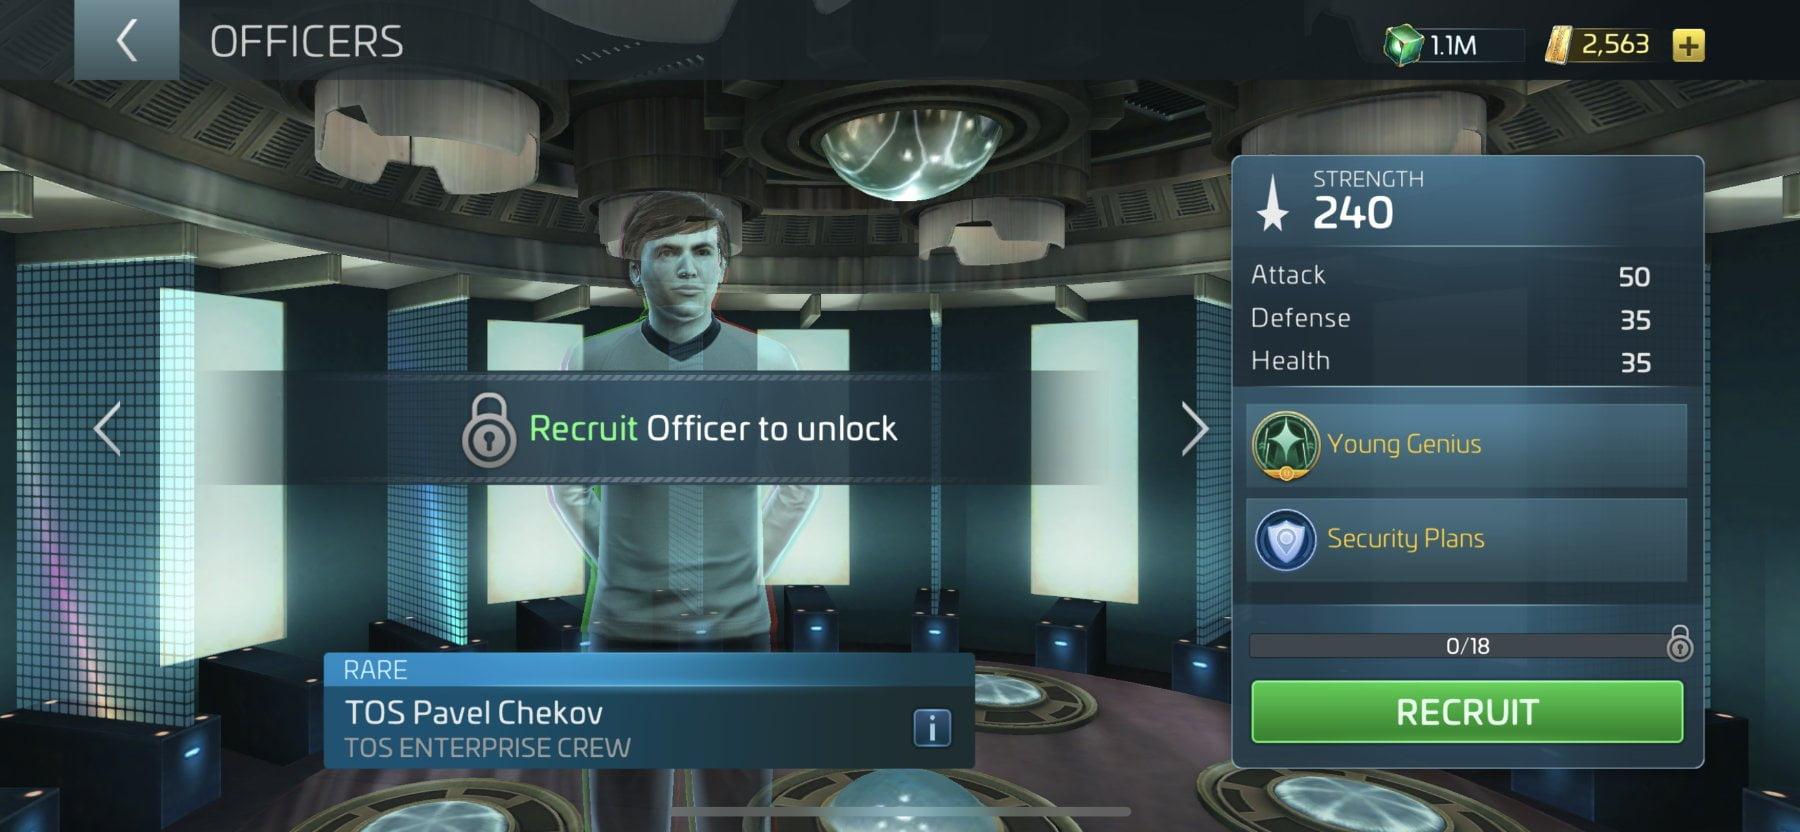 Star Trek Fleet Command Officer TOS Pavel Chekov